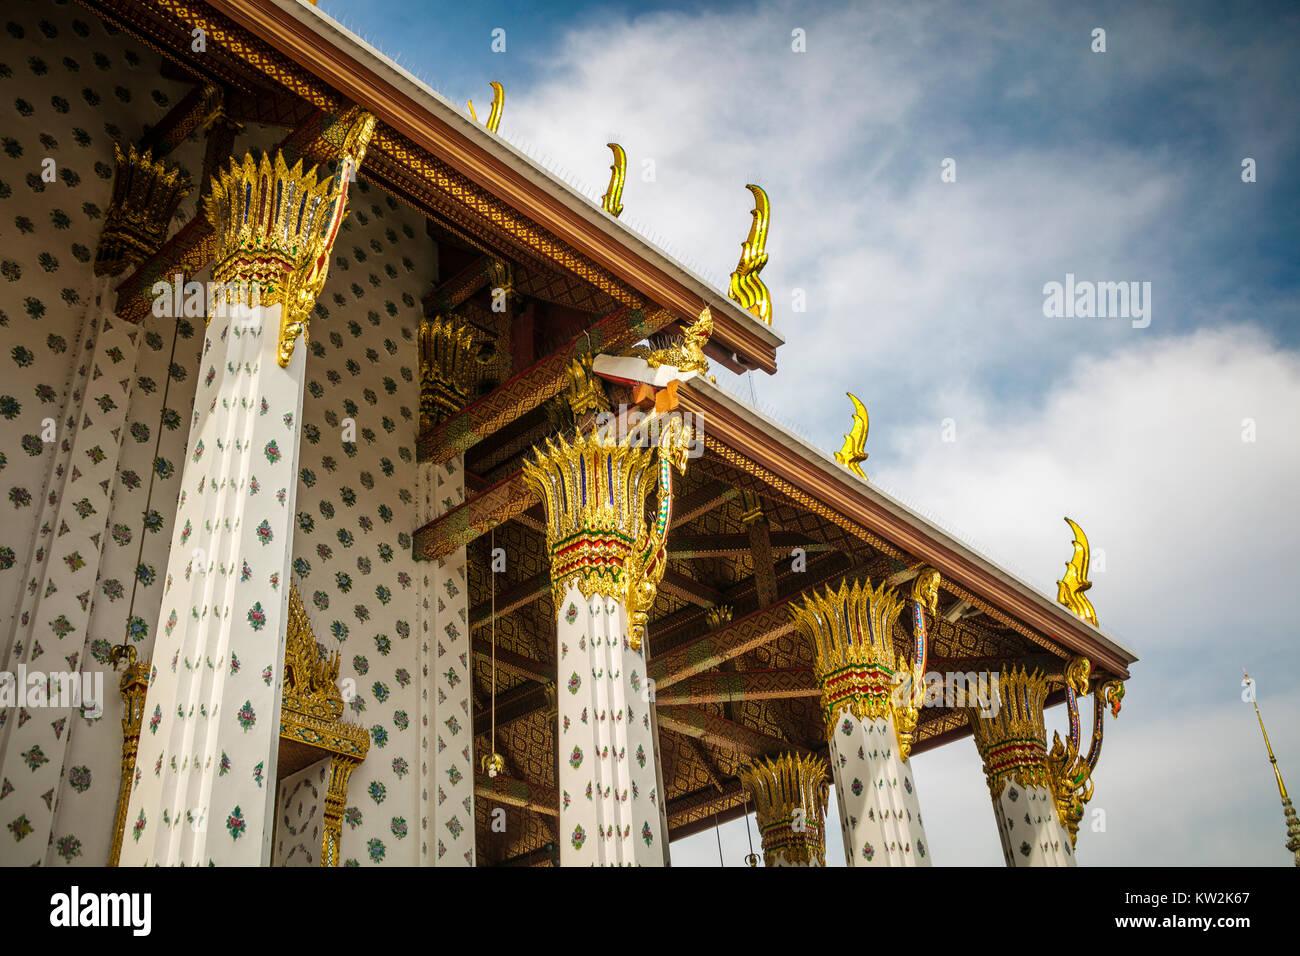 Roof detail, Wat Arun, Temple of the Dawn, Bangkok, Thailand. - Stock Image